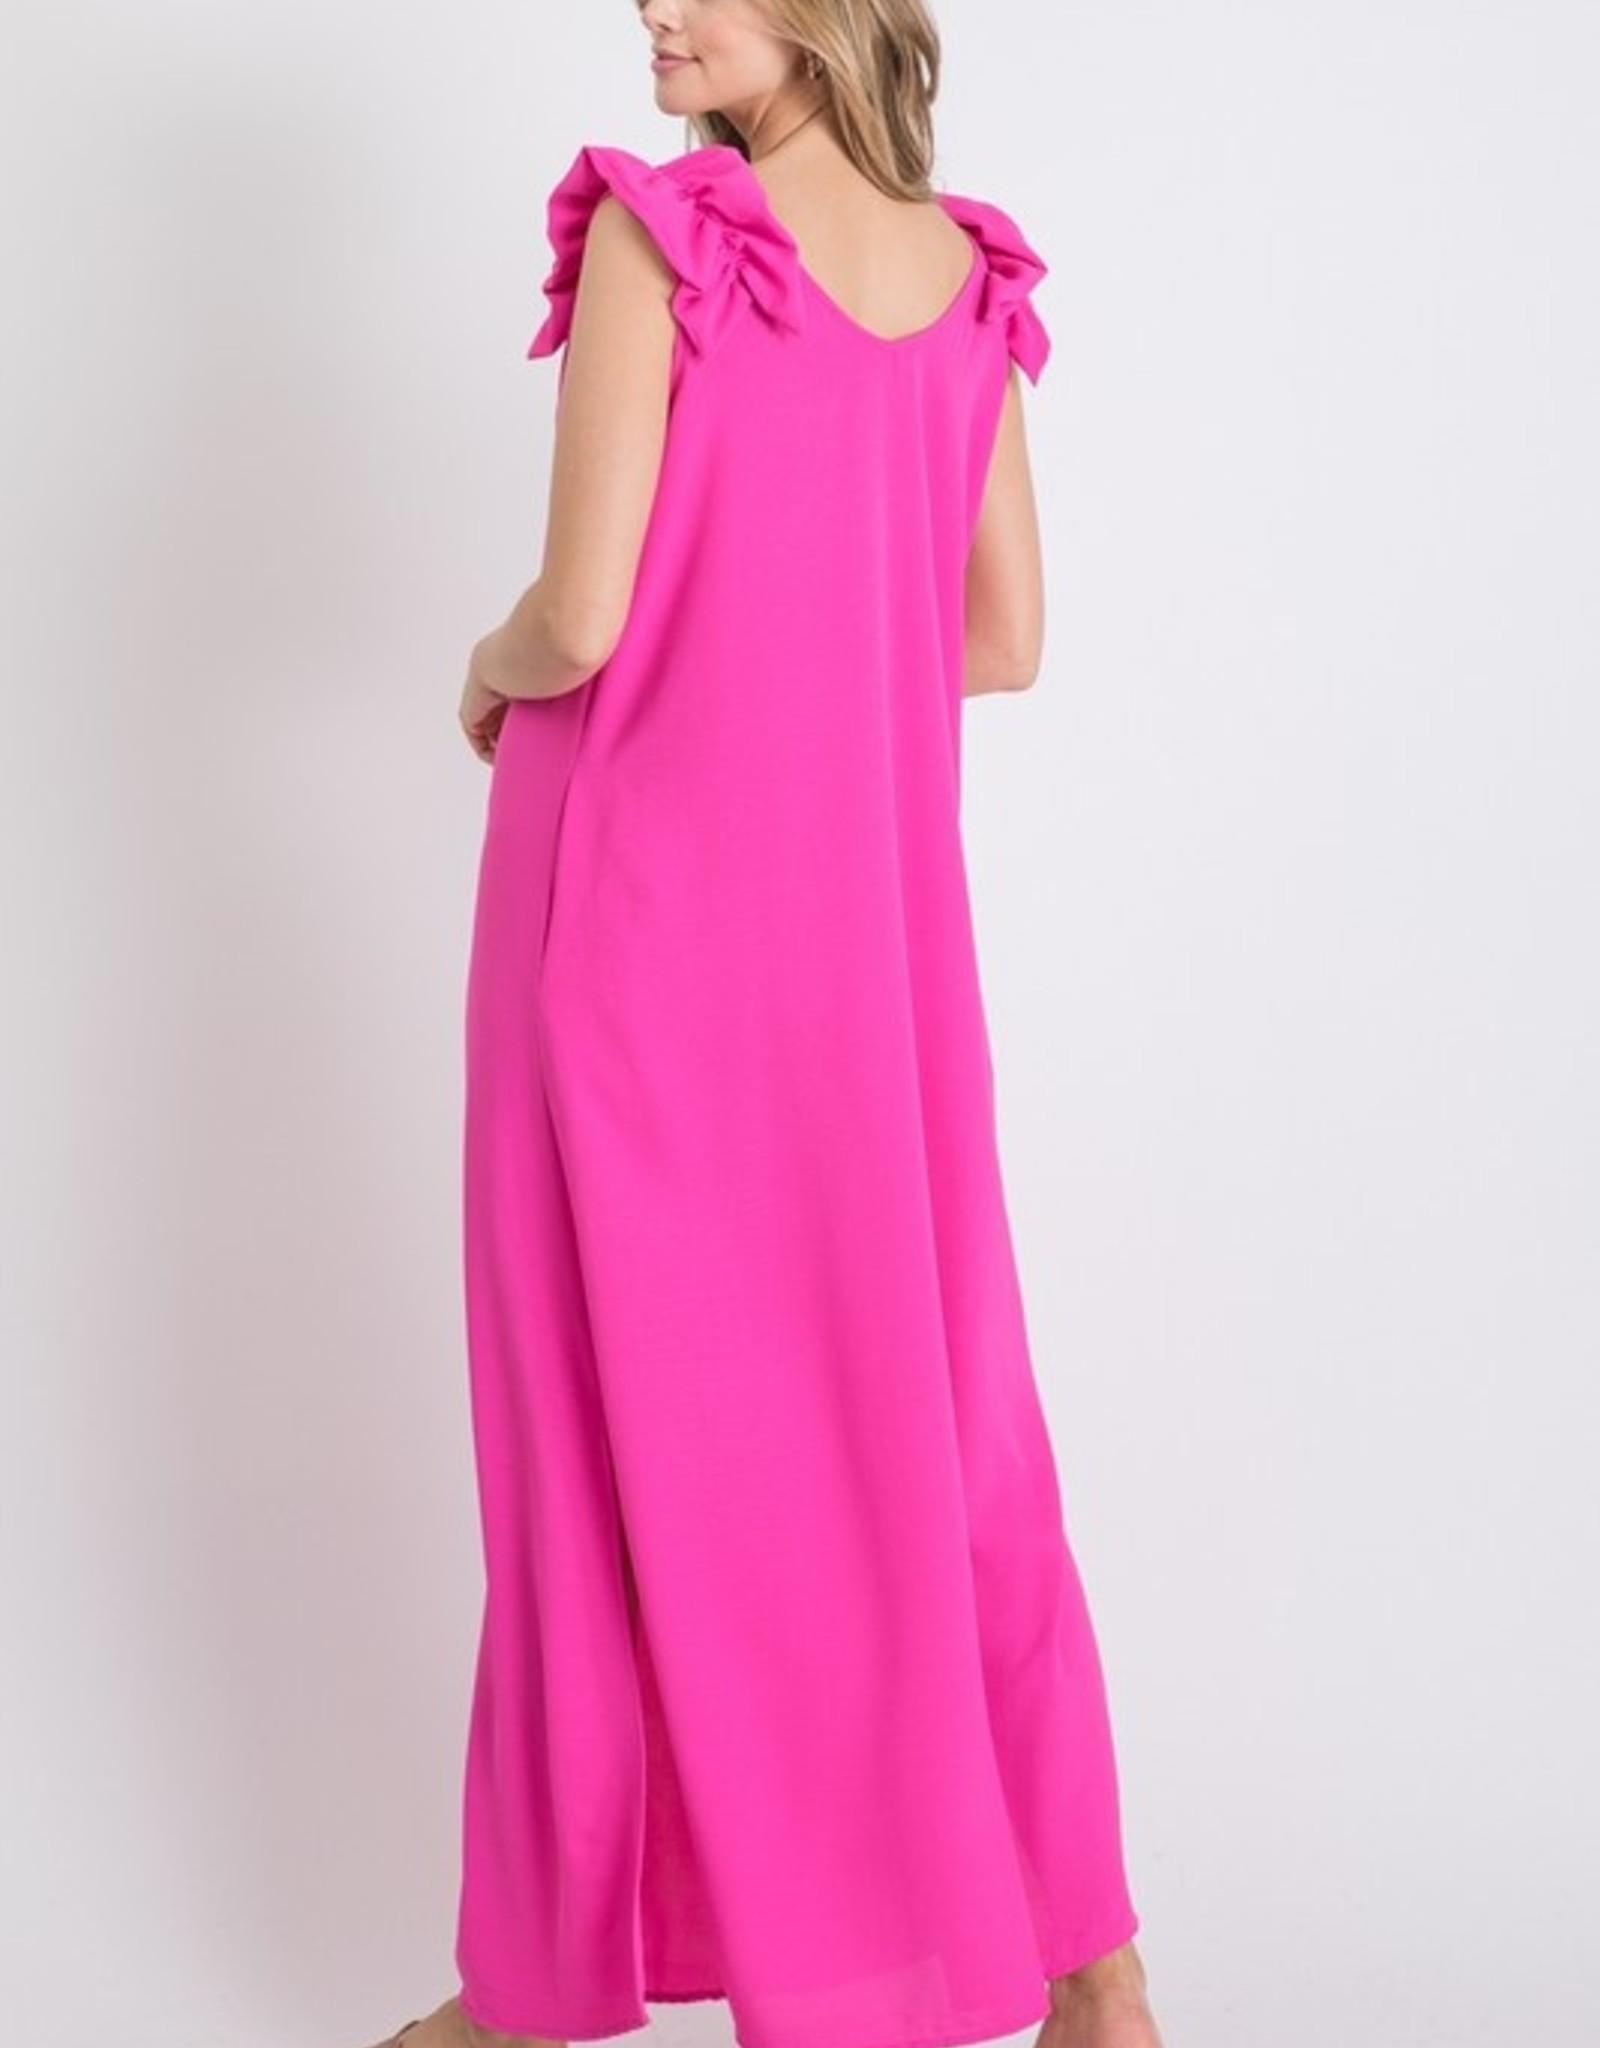 Totally Pink Ruffled Maxi